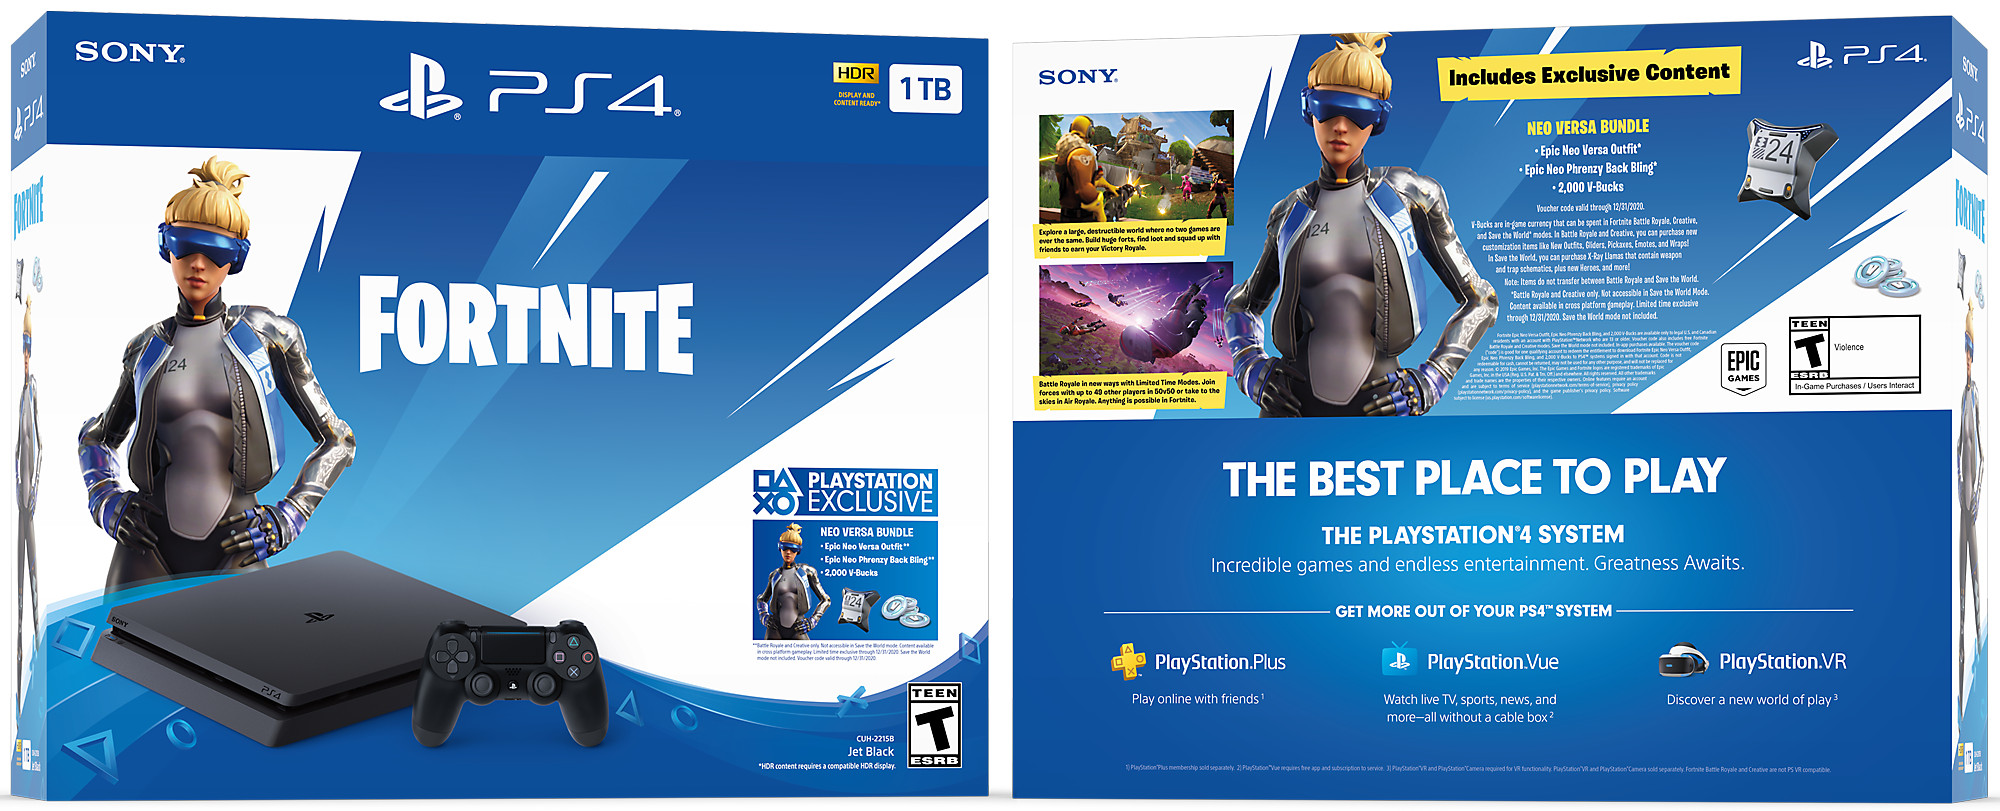 Fortnite Neo Versa PlayStation®4 Bundle | PS4 - PlayStation